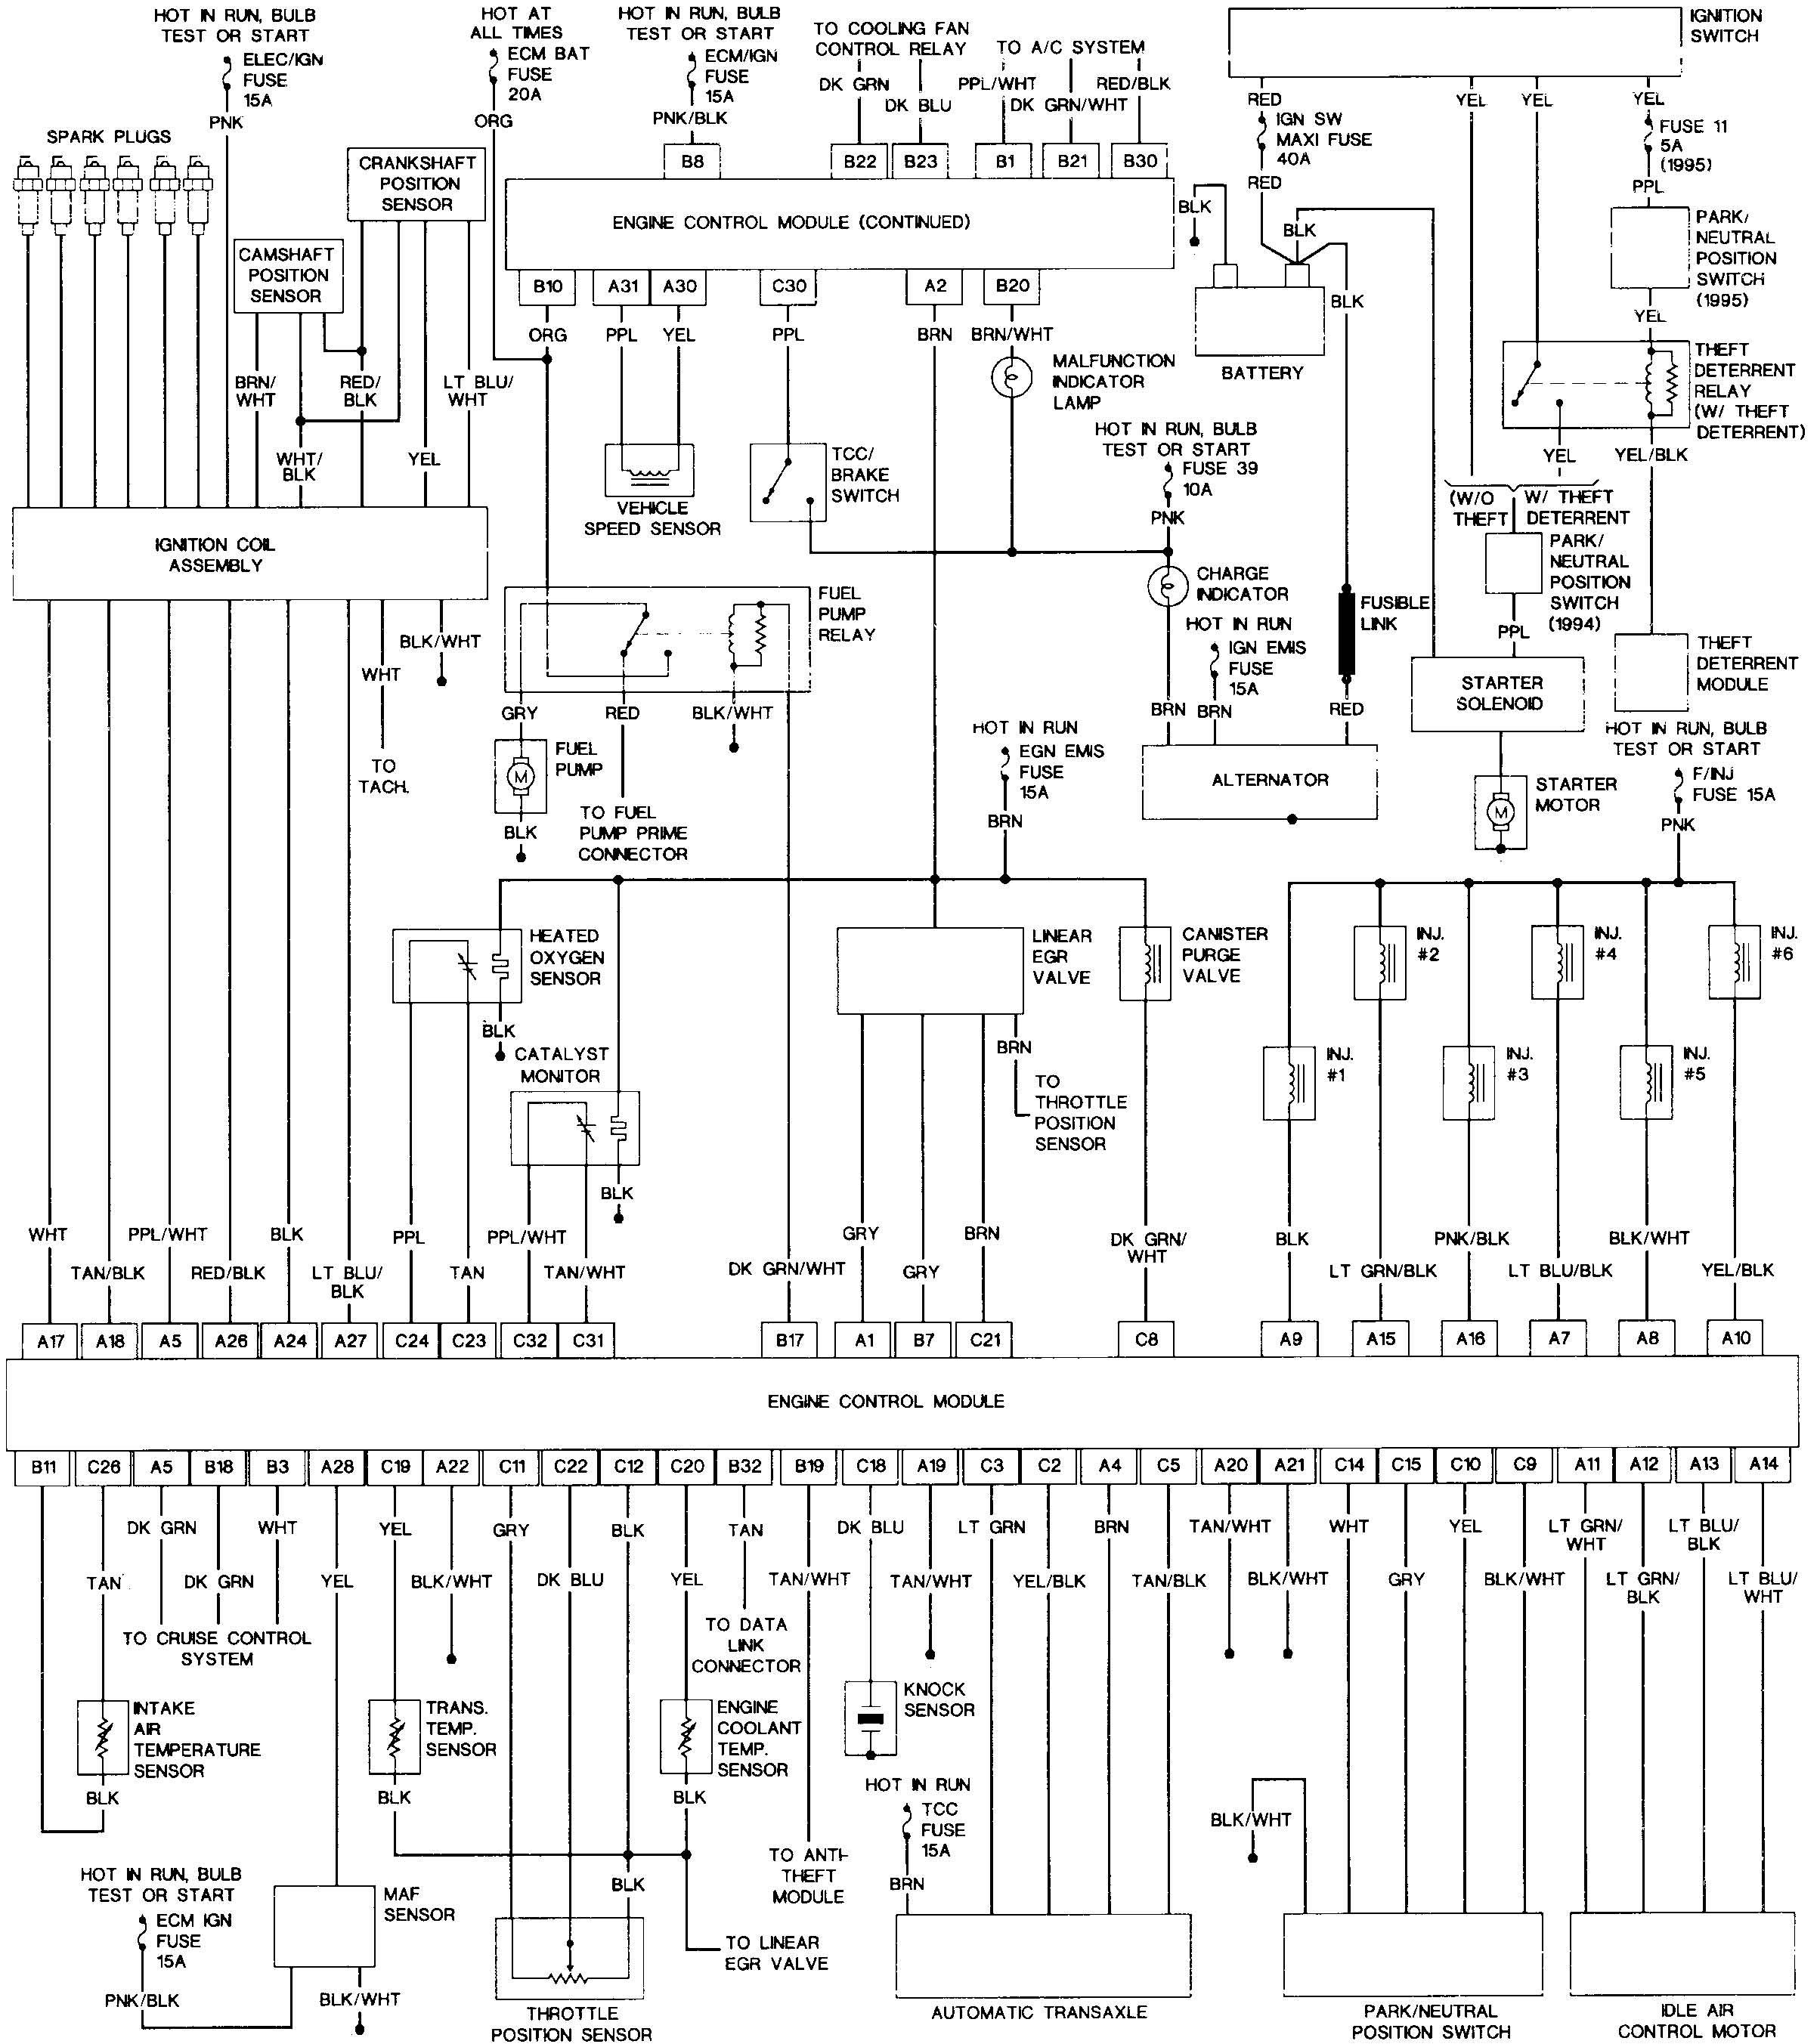 2003 jeep grand cherokee radio wiring diagram xy 8976  fuse box jeep grand cherokee 2011 download diagram  xy 8976  fuse box jeep grand cherokee